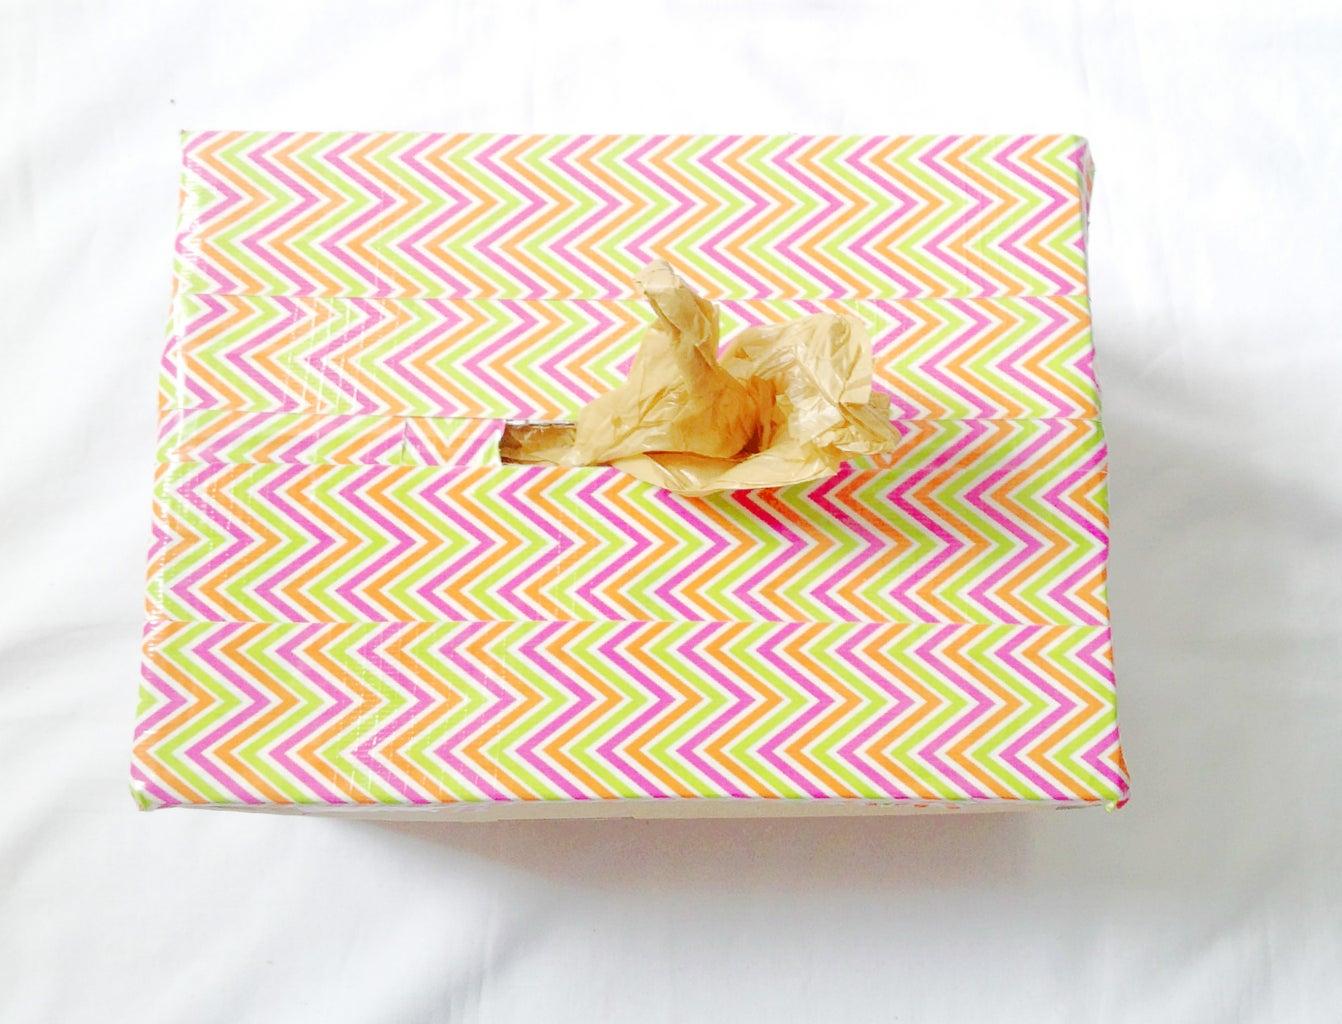 Bonus : How to Organize Plastic Bags in a Box